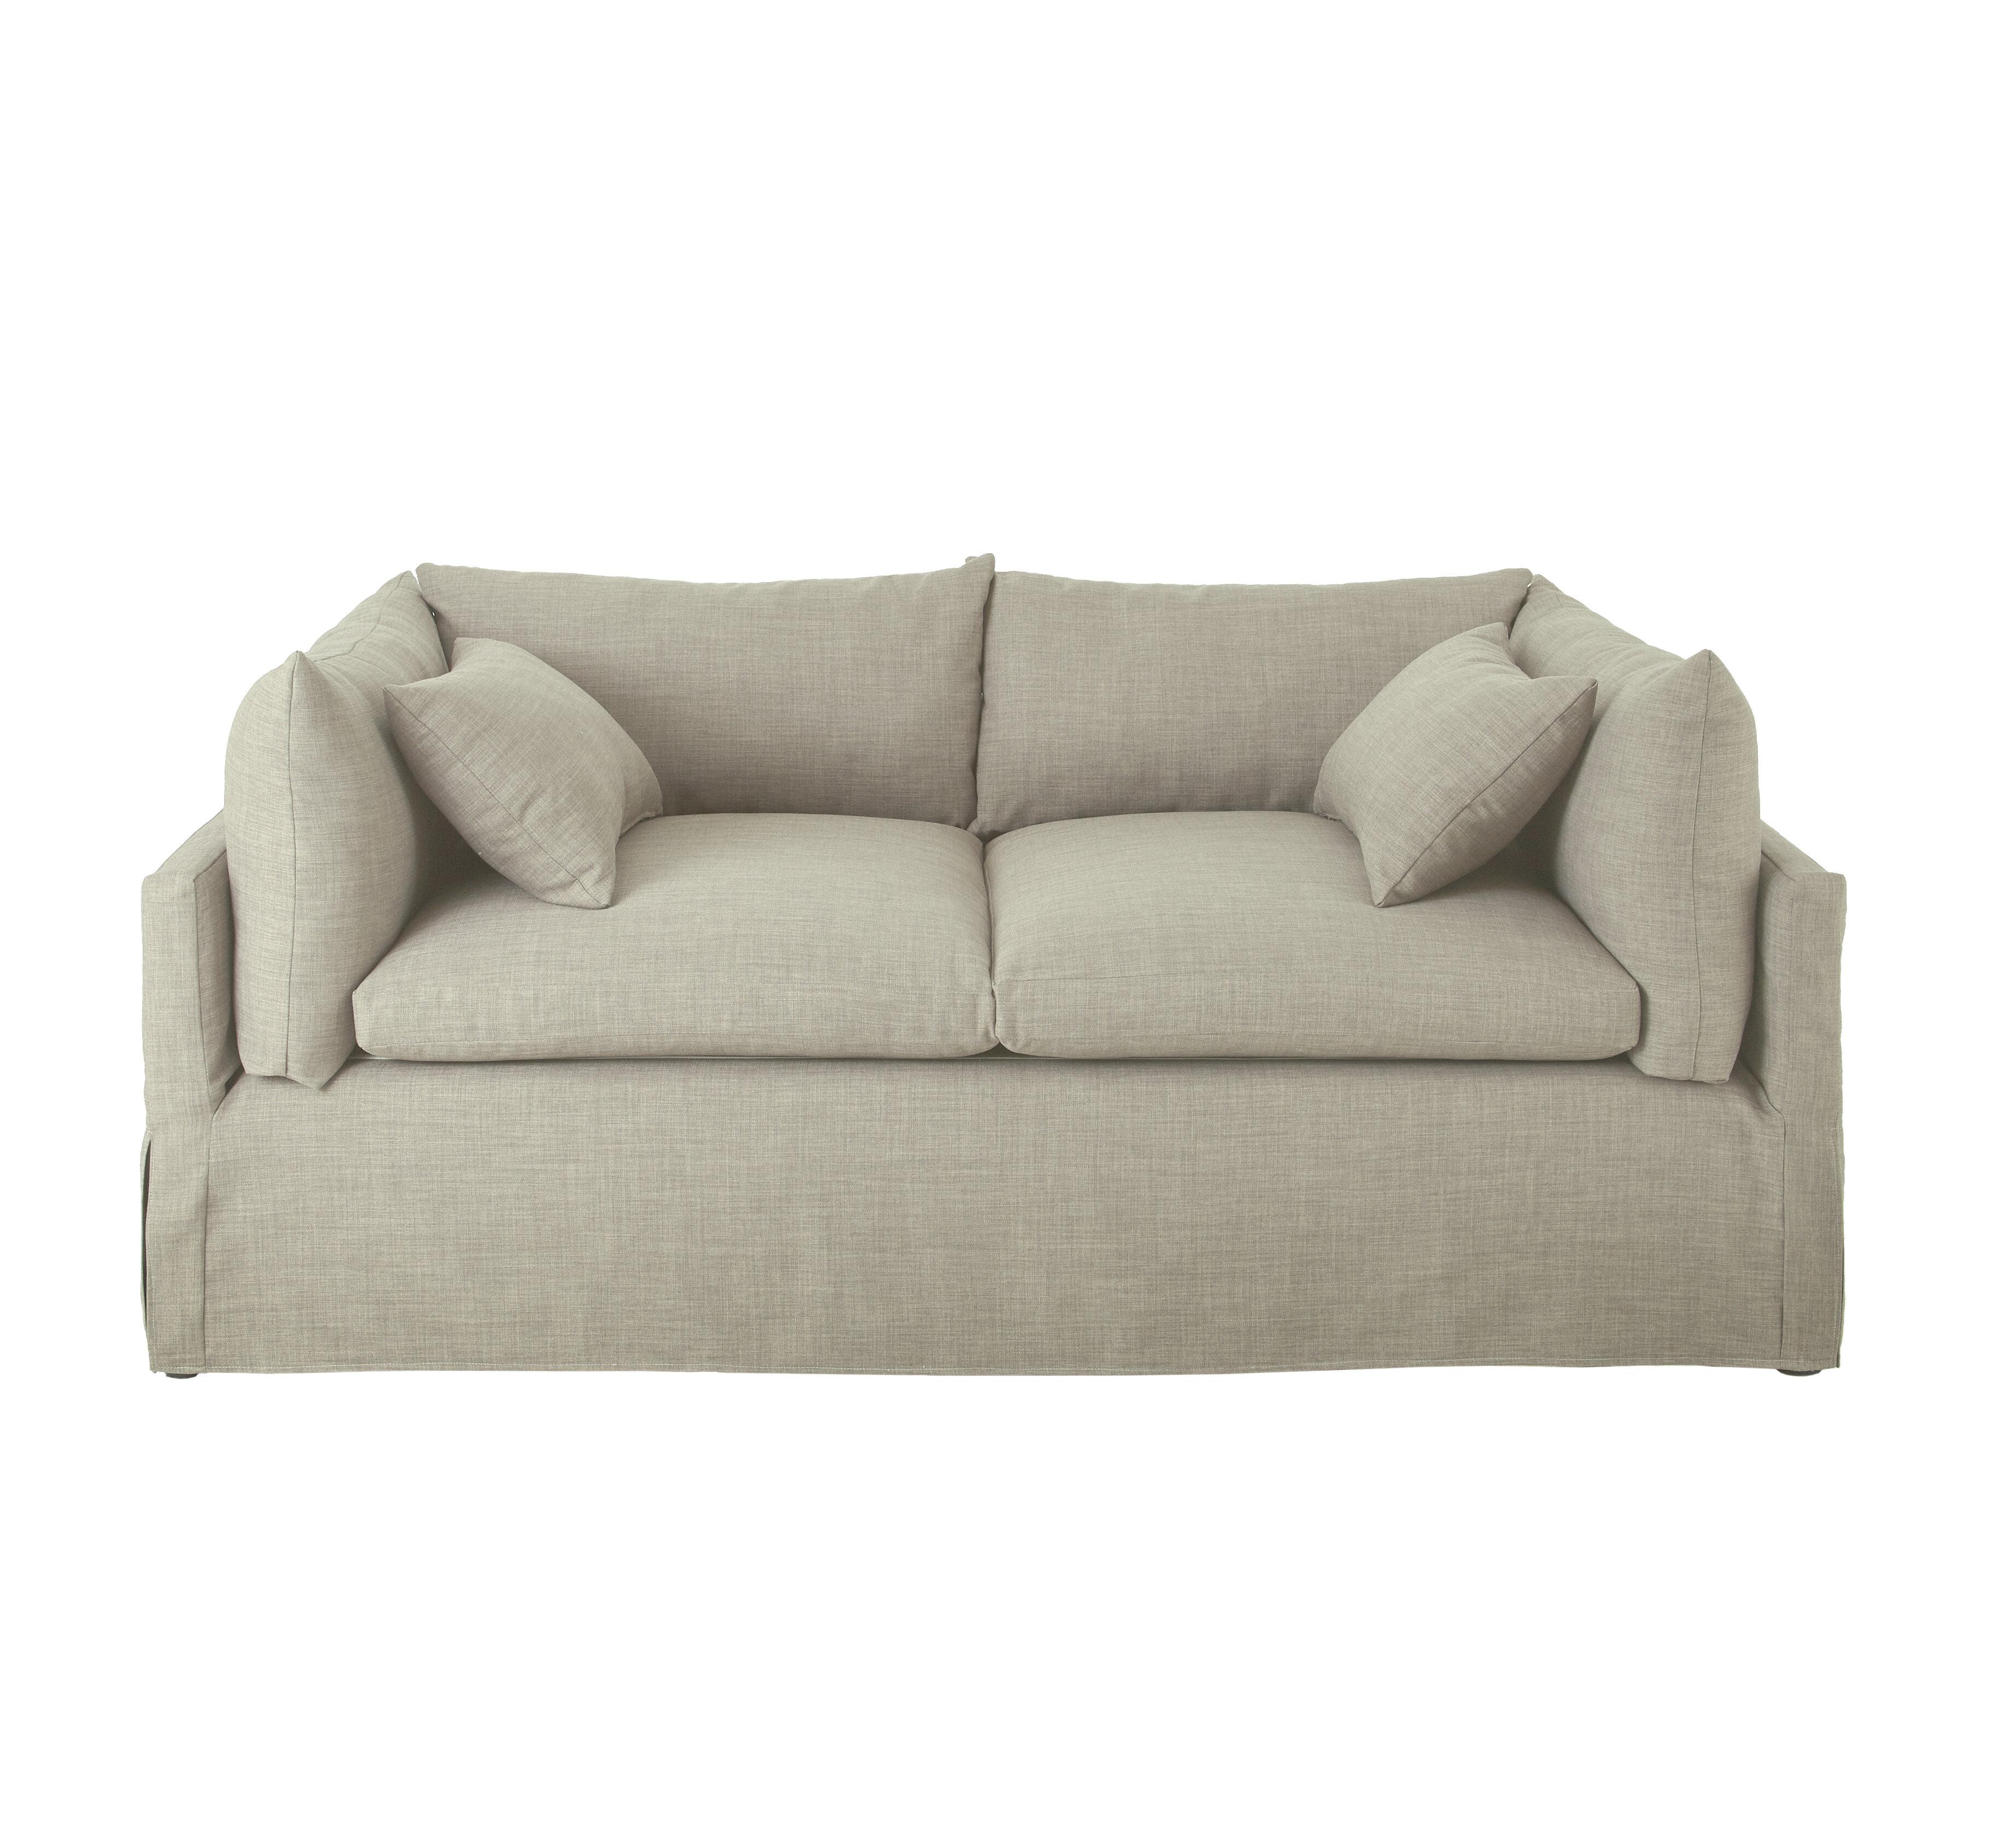 Home by Sean & Catherine Lowe Manhattan Sleeper Sofa & Reviews | Wayfair